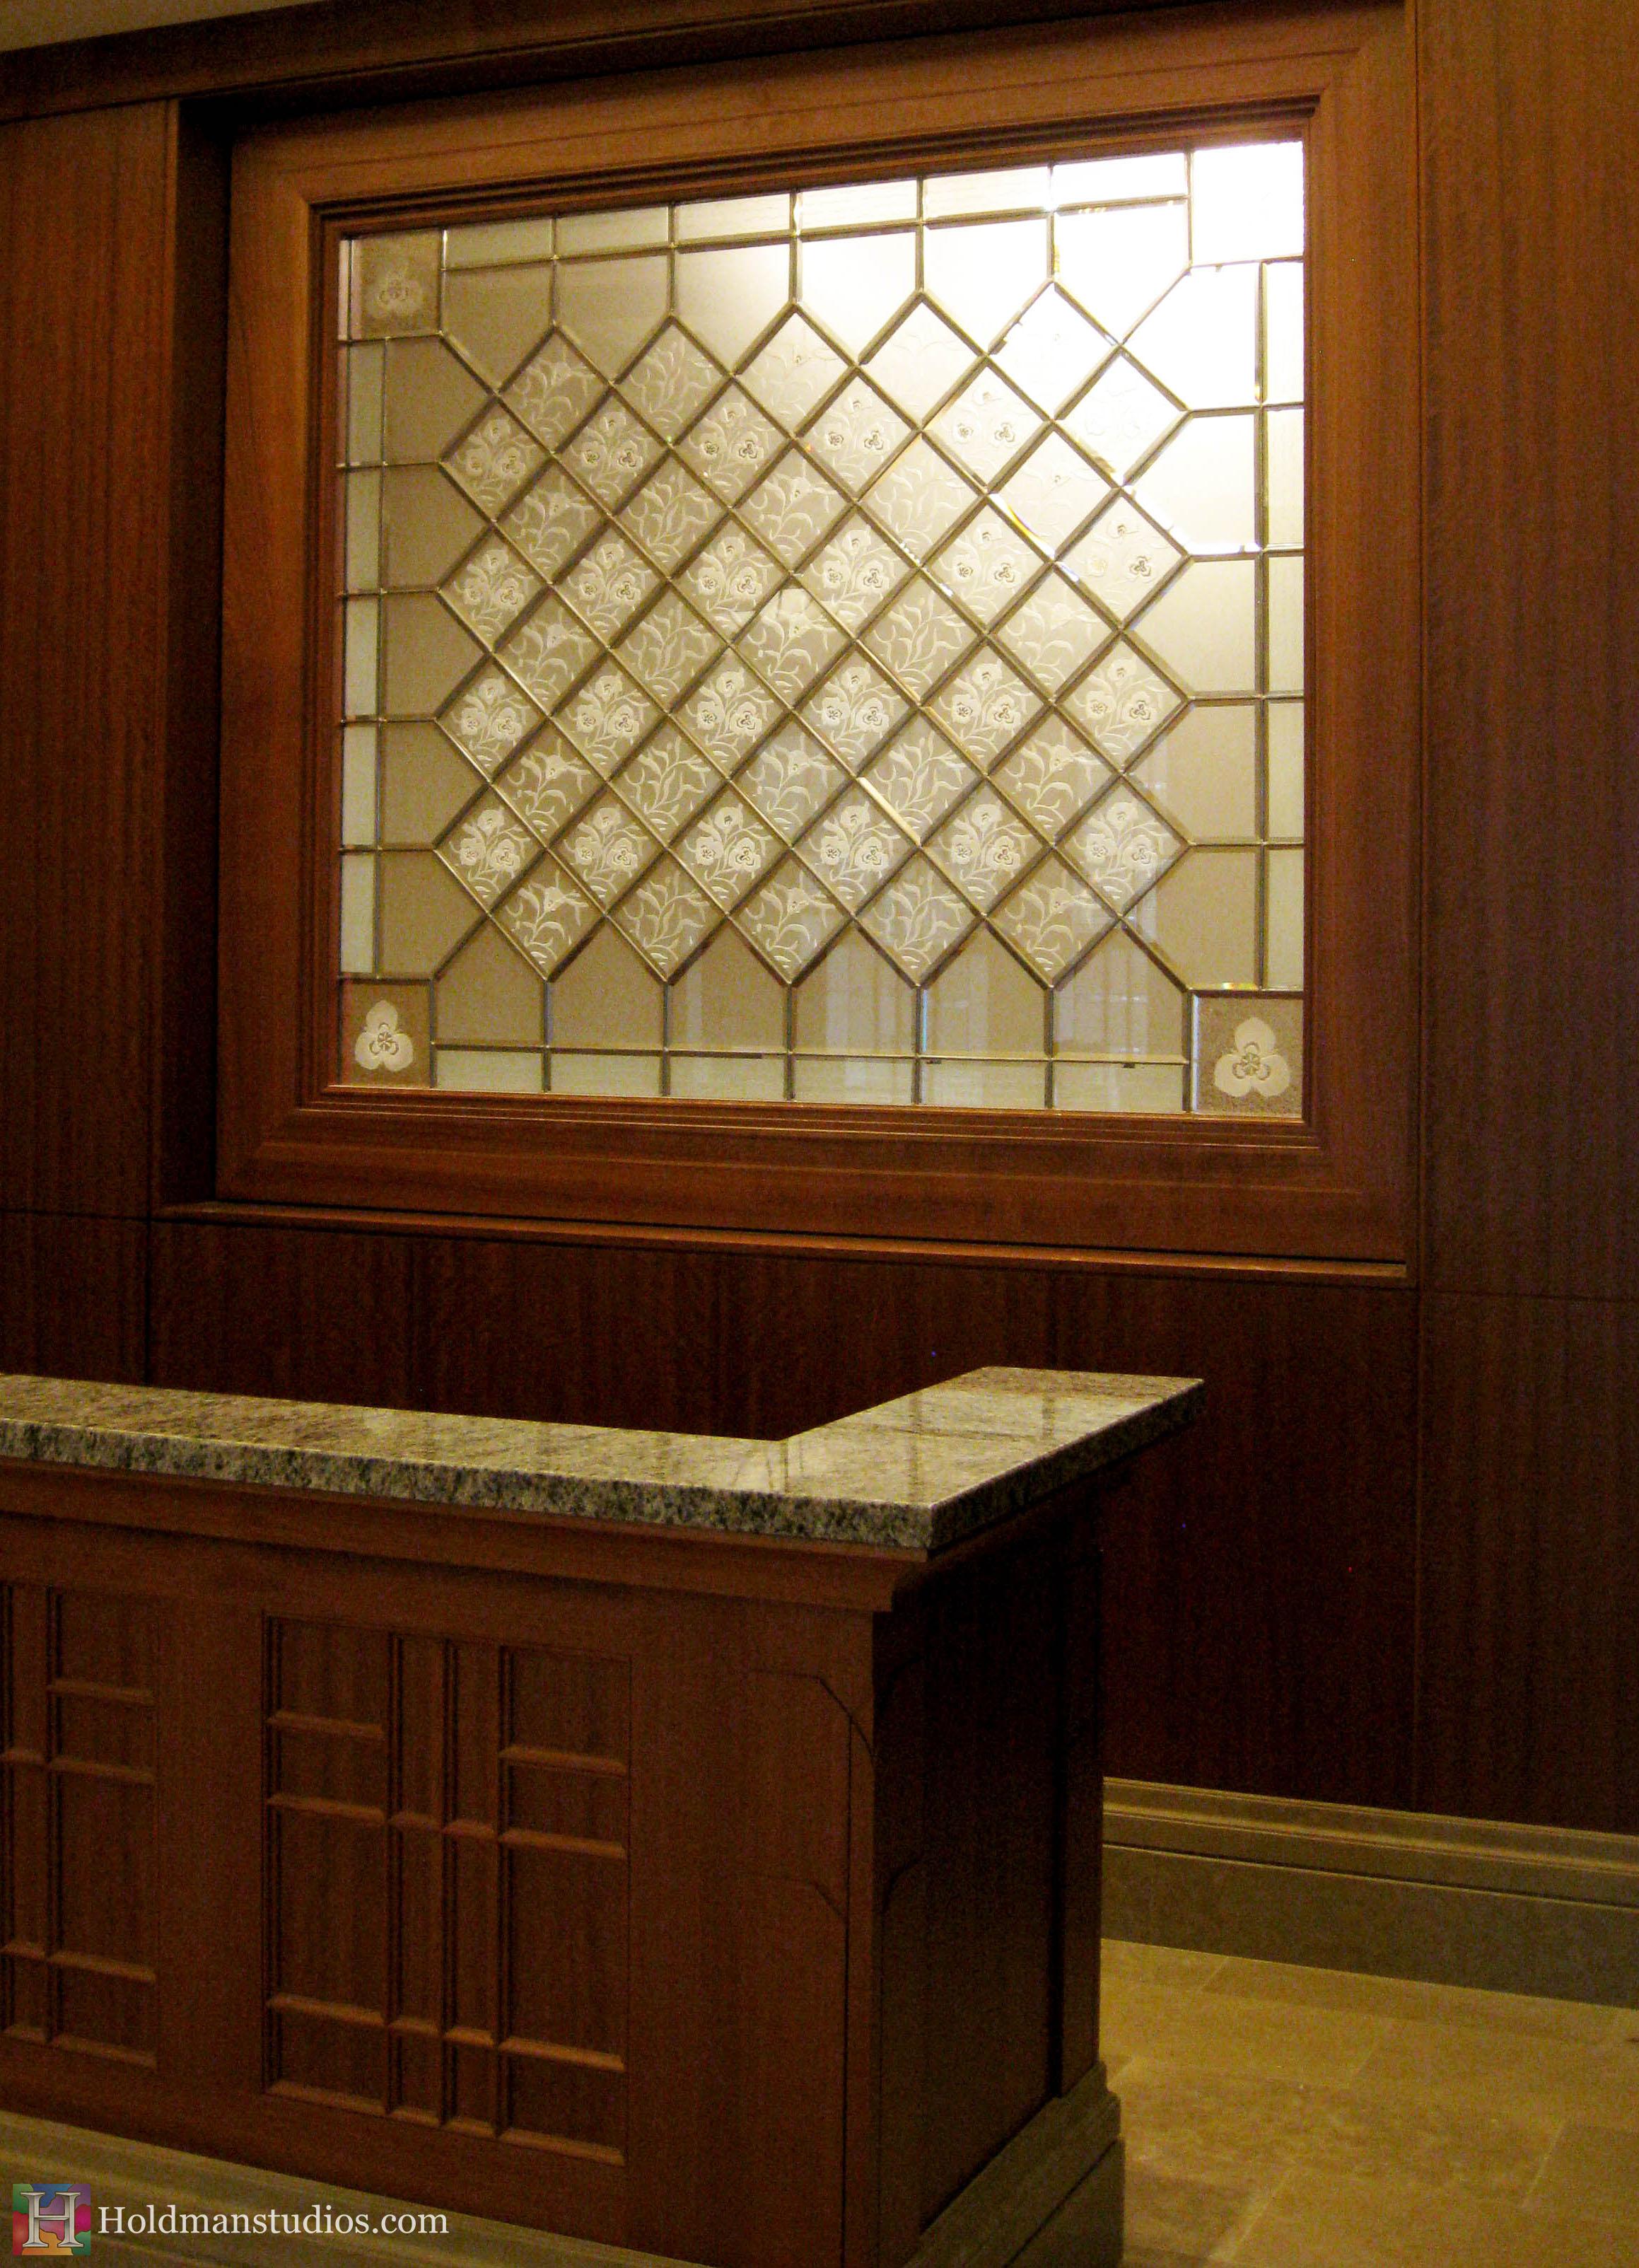 Holdman Studio Stained Glass Art Glass sego lily desk Mormon Draper Temple LDS.jpg